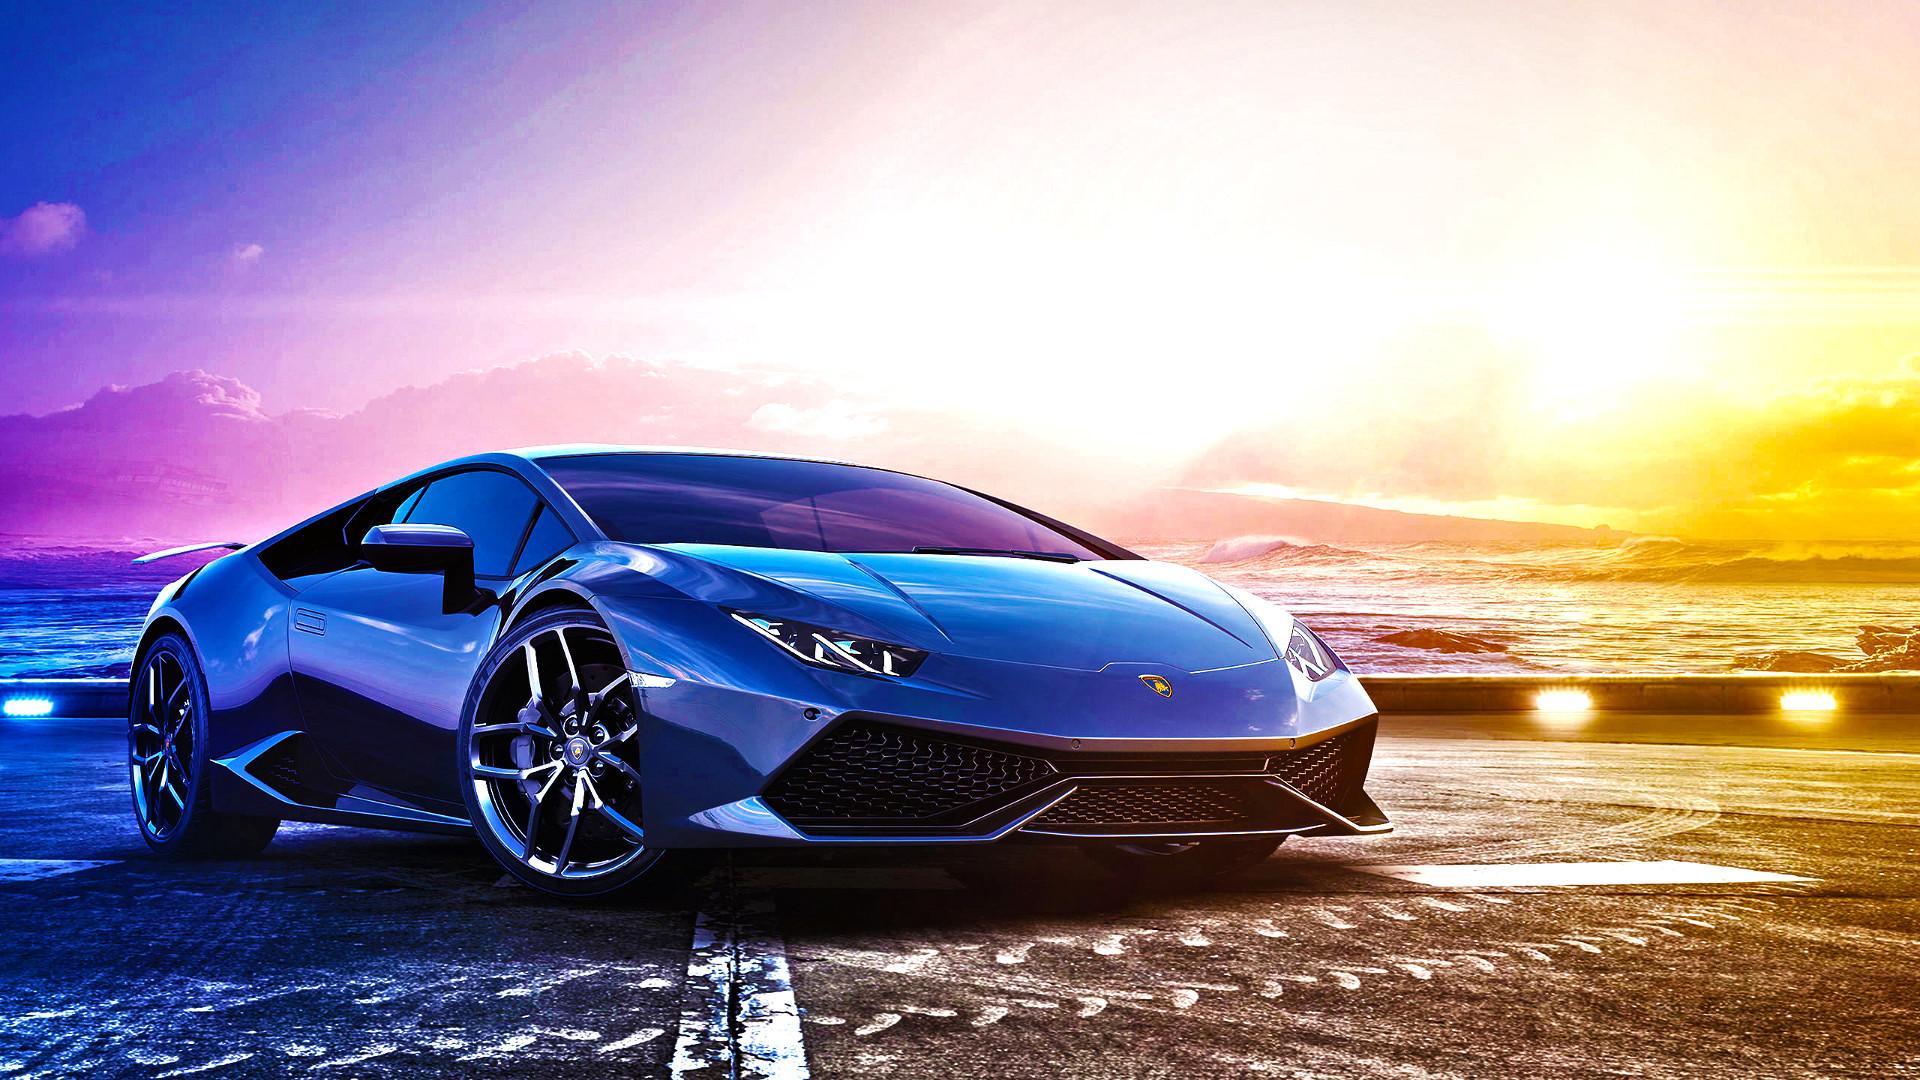 Lamborghini HD Wallpaper (81+ images)